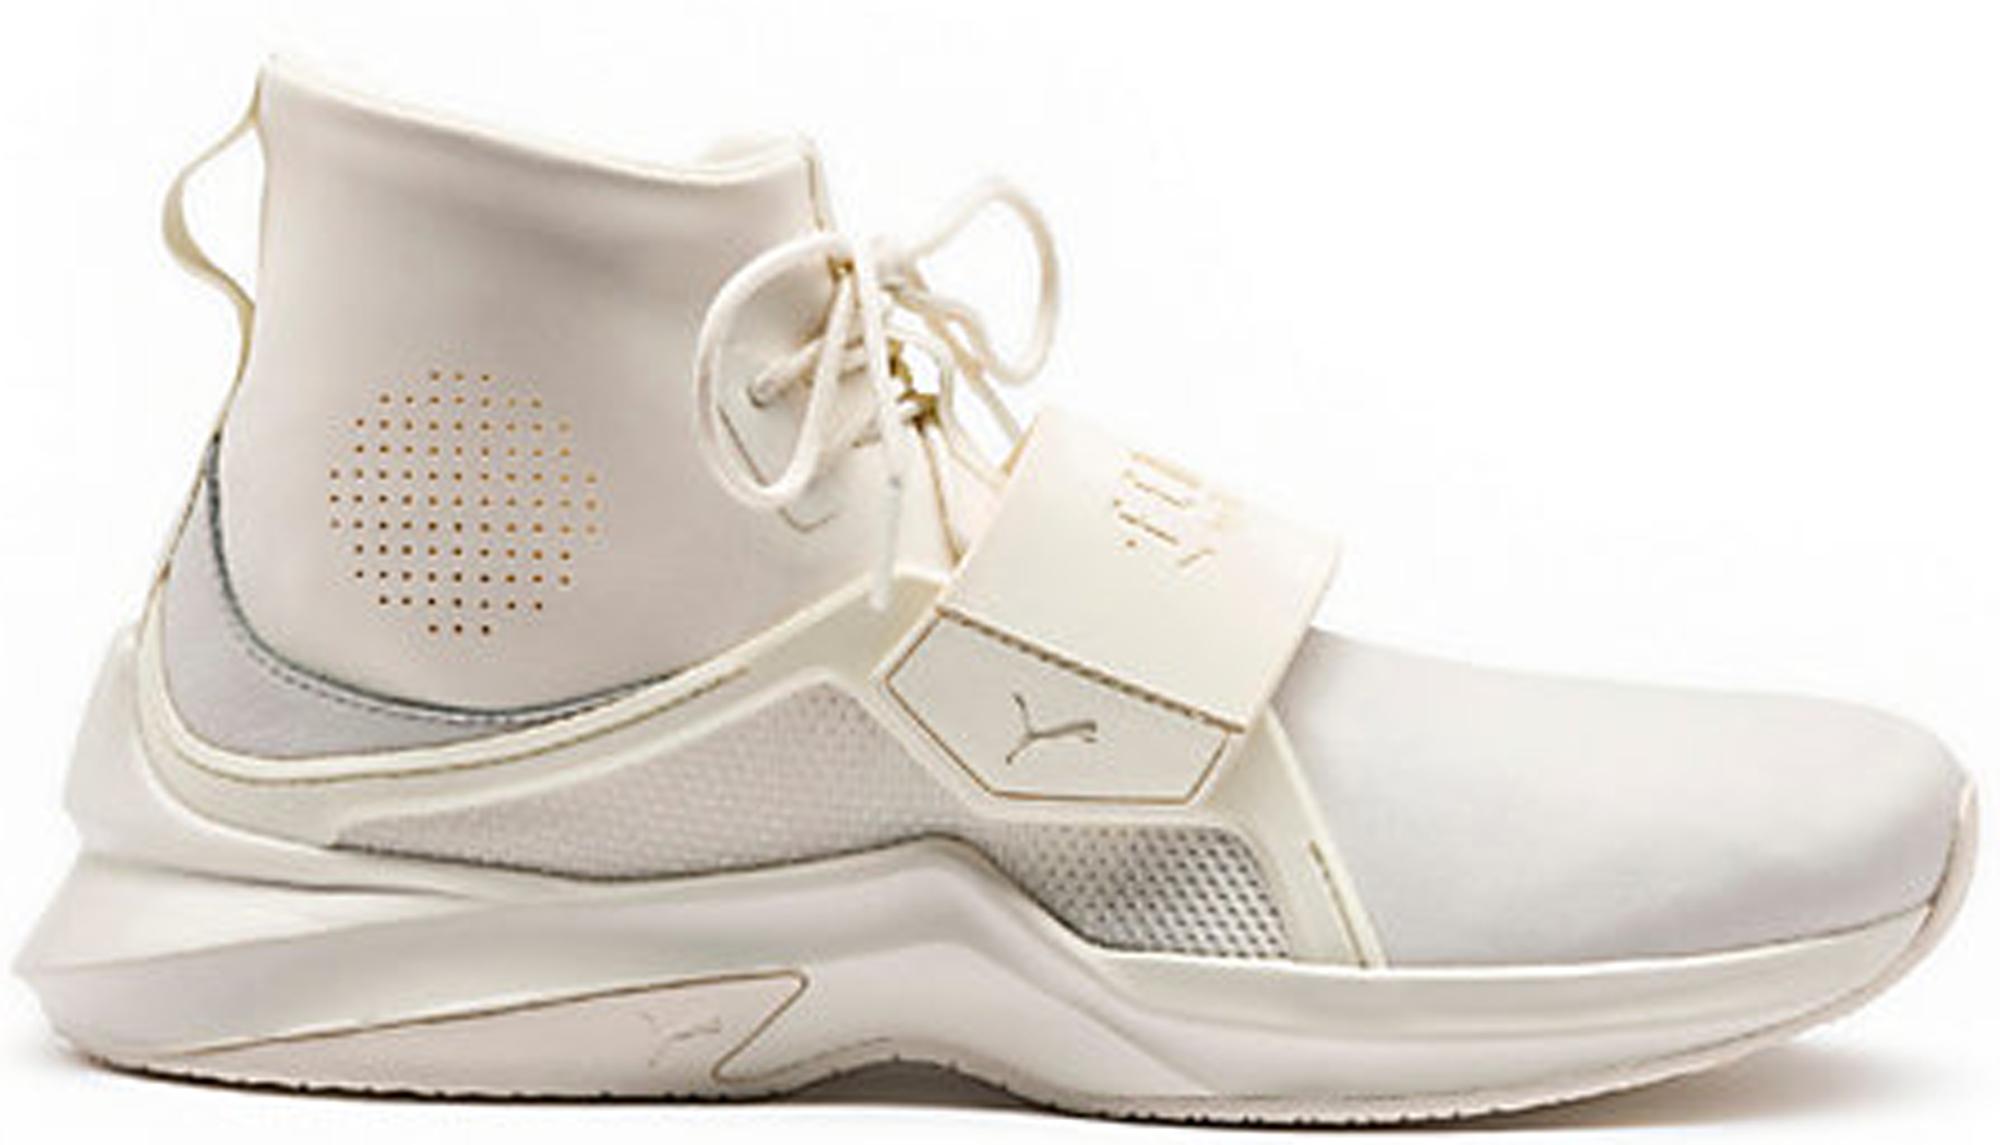 f7c1cbe1a43a Rihanna x Puma Fenty Leather Hi White (W) - StockX News